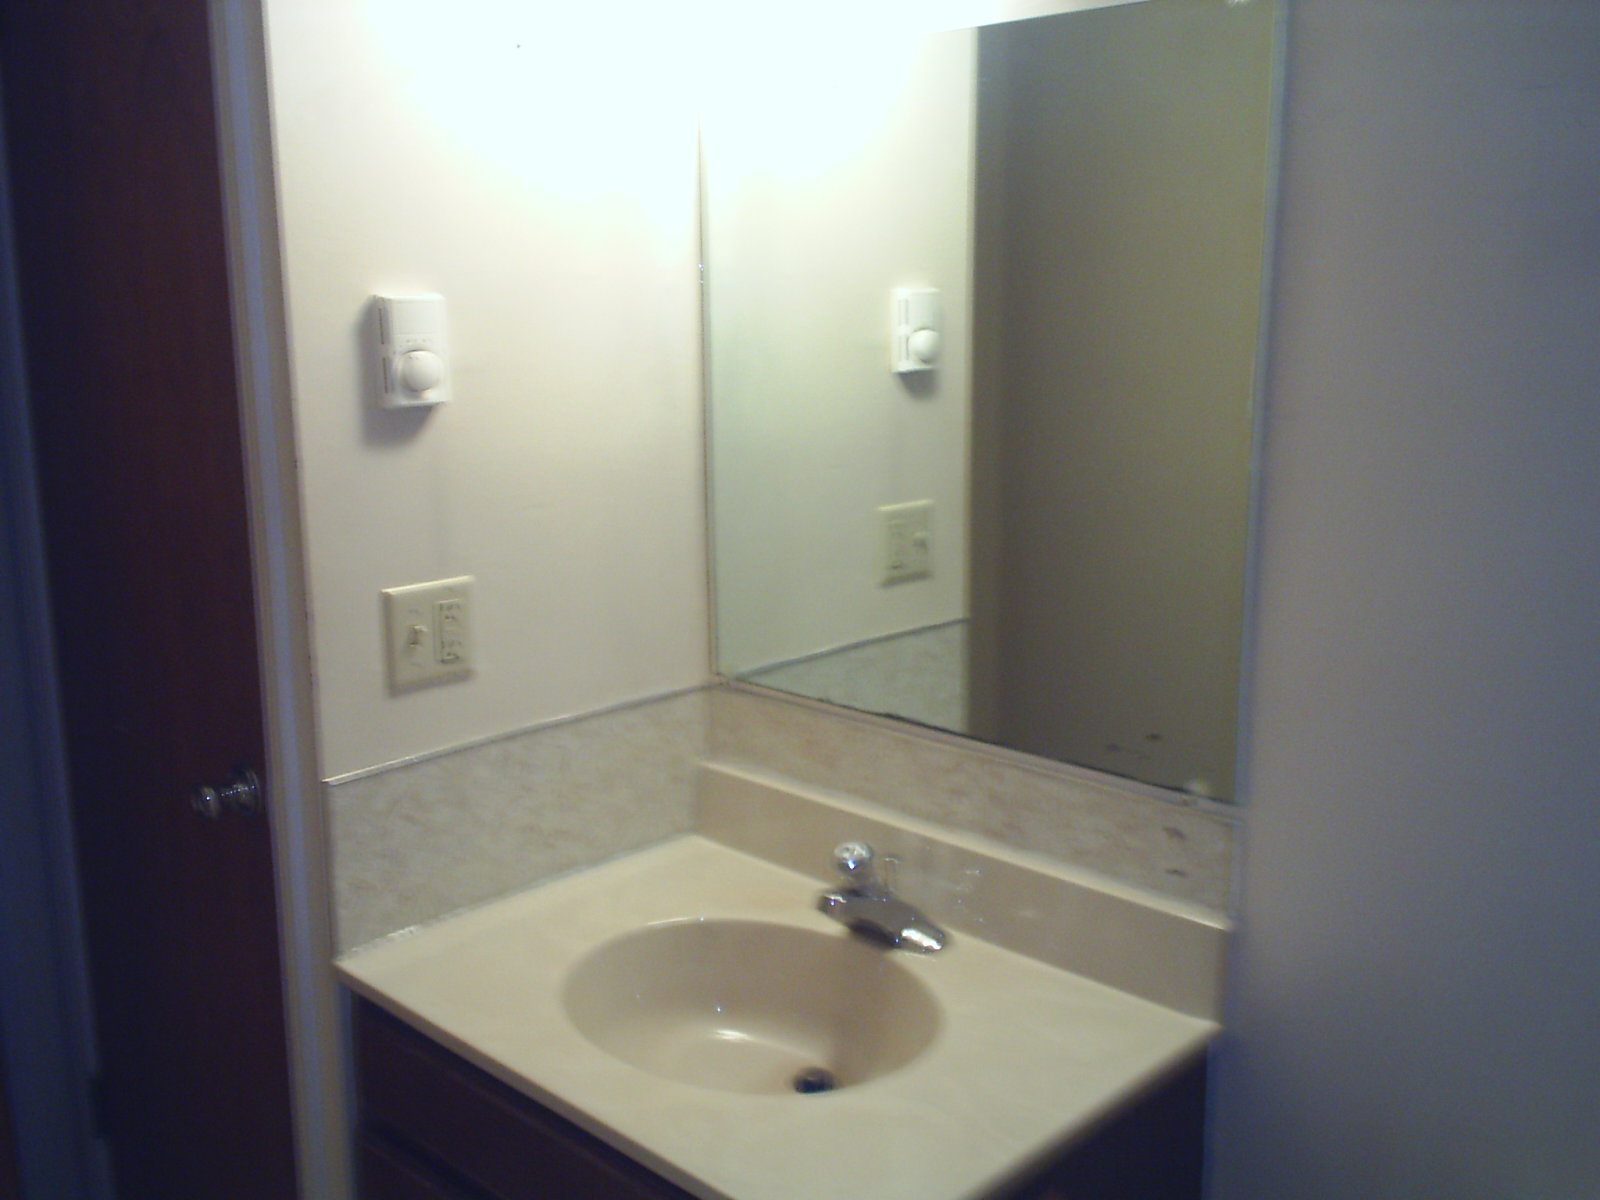 http://4.bp.blogspot.com/-C3sGMETBjWU/ToRooCbci8I/AAAAAAAACM4/cSuTd0oKRVU/s1600/Bathroom+mirror+before.jpg